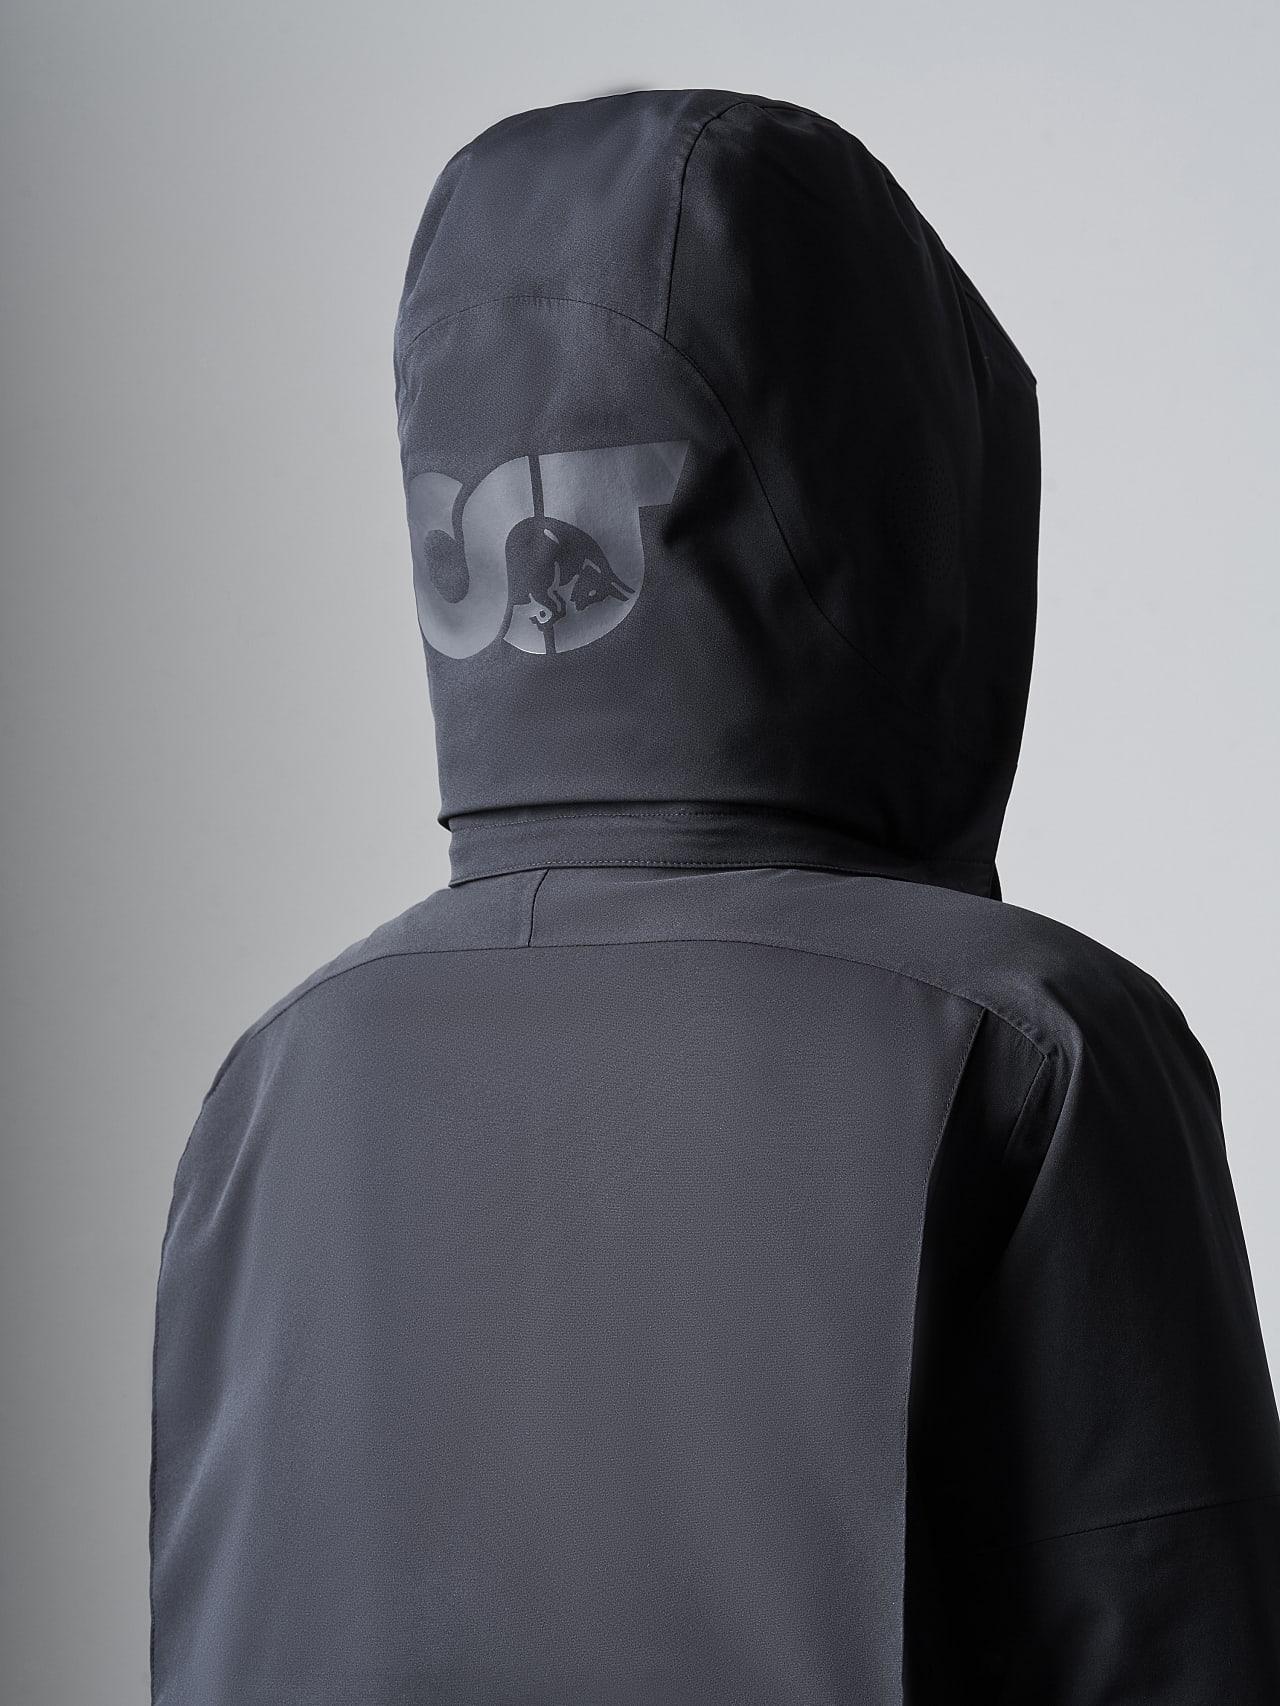 KUUV V2.Y4.02 Packable Waterproof Winter Parka black scene7.view.9.name Alpha Tauri